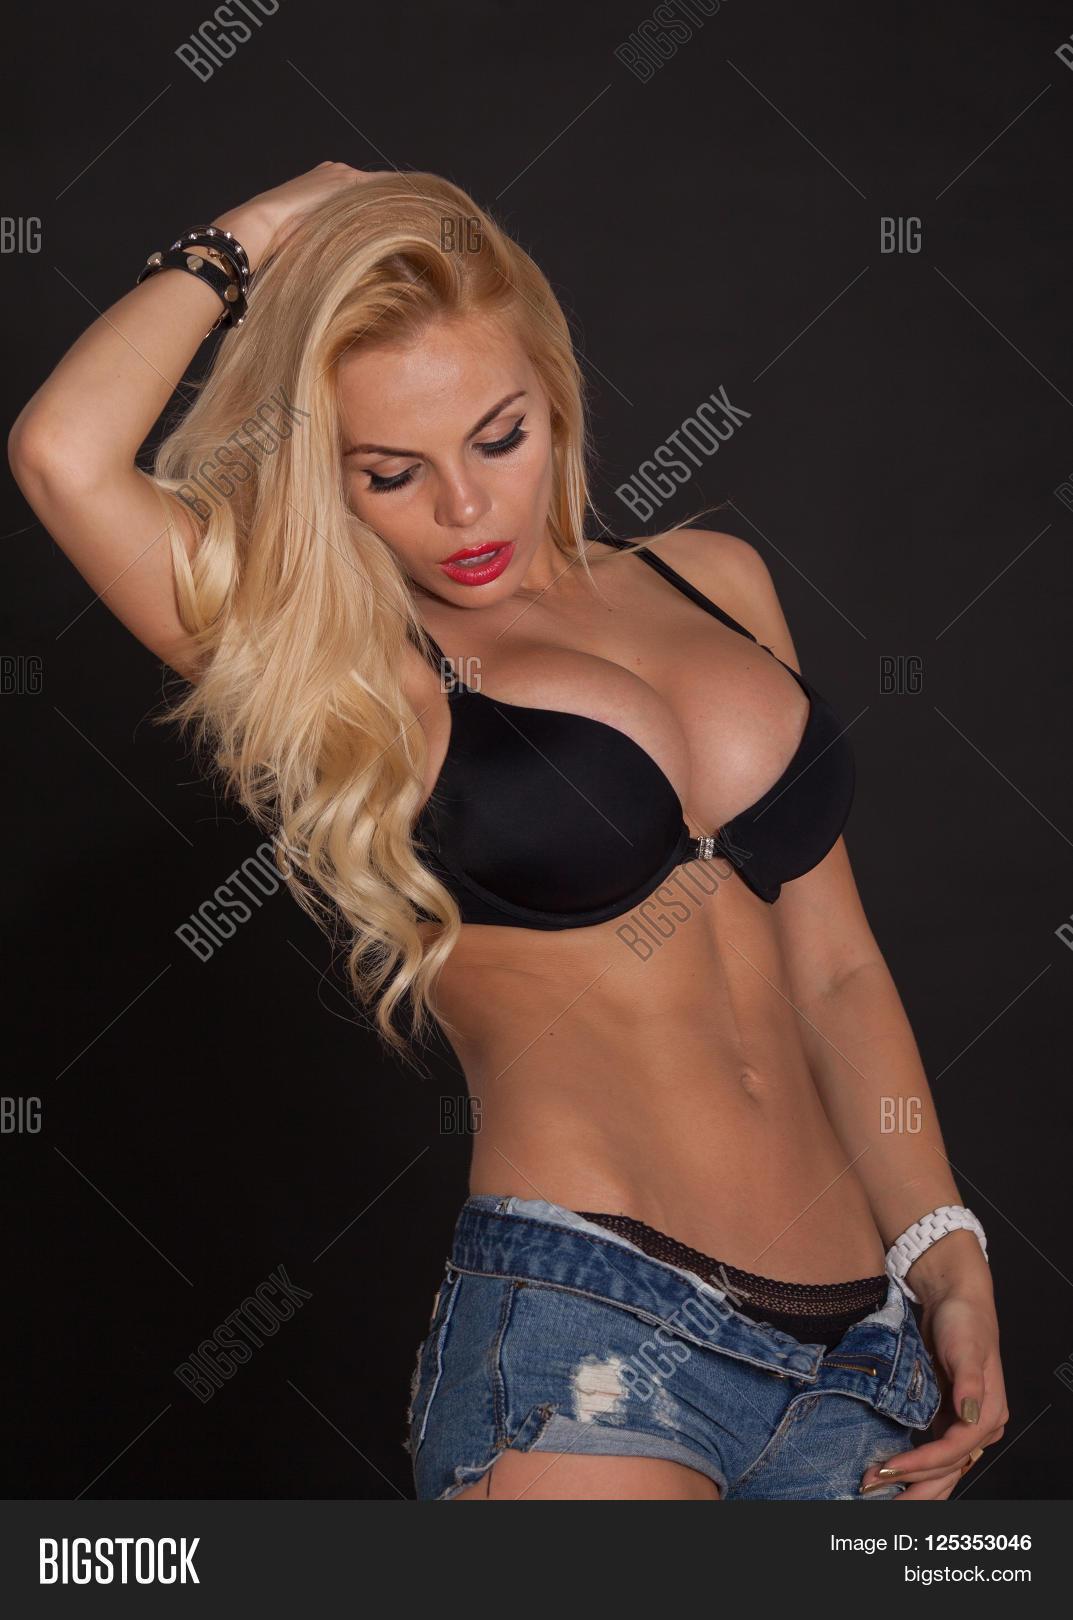 Blond hot women Fashionable Sexy Blond Image Photo Free Trial Bigstock